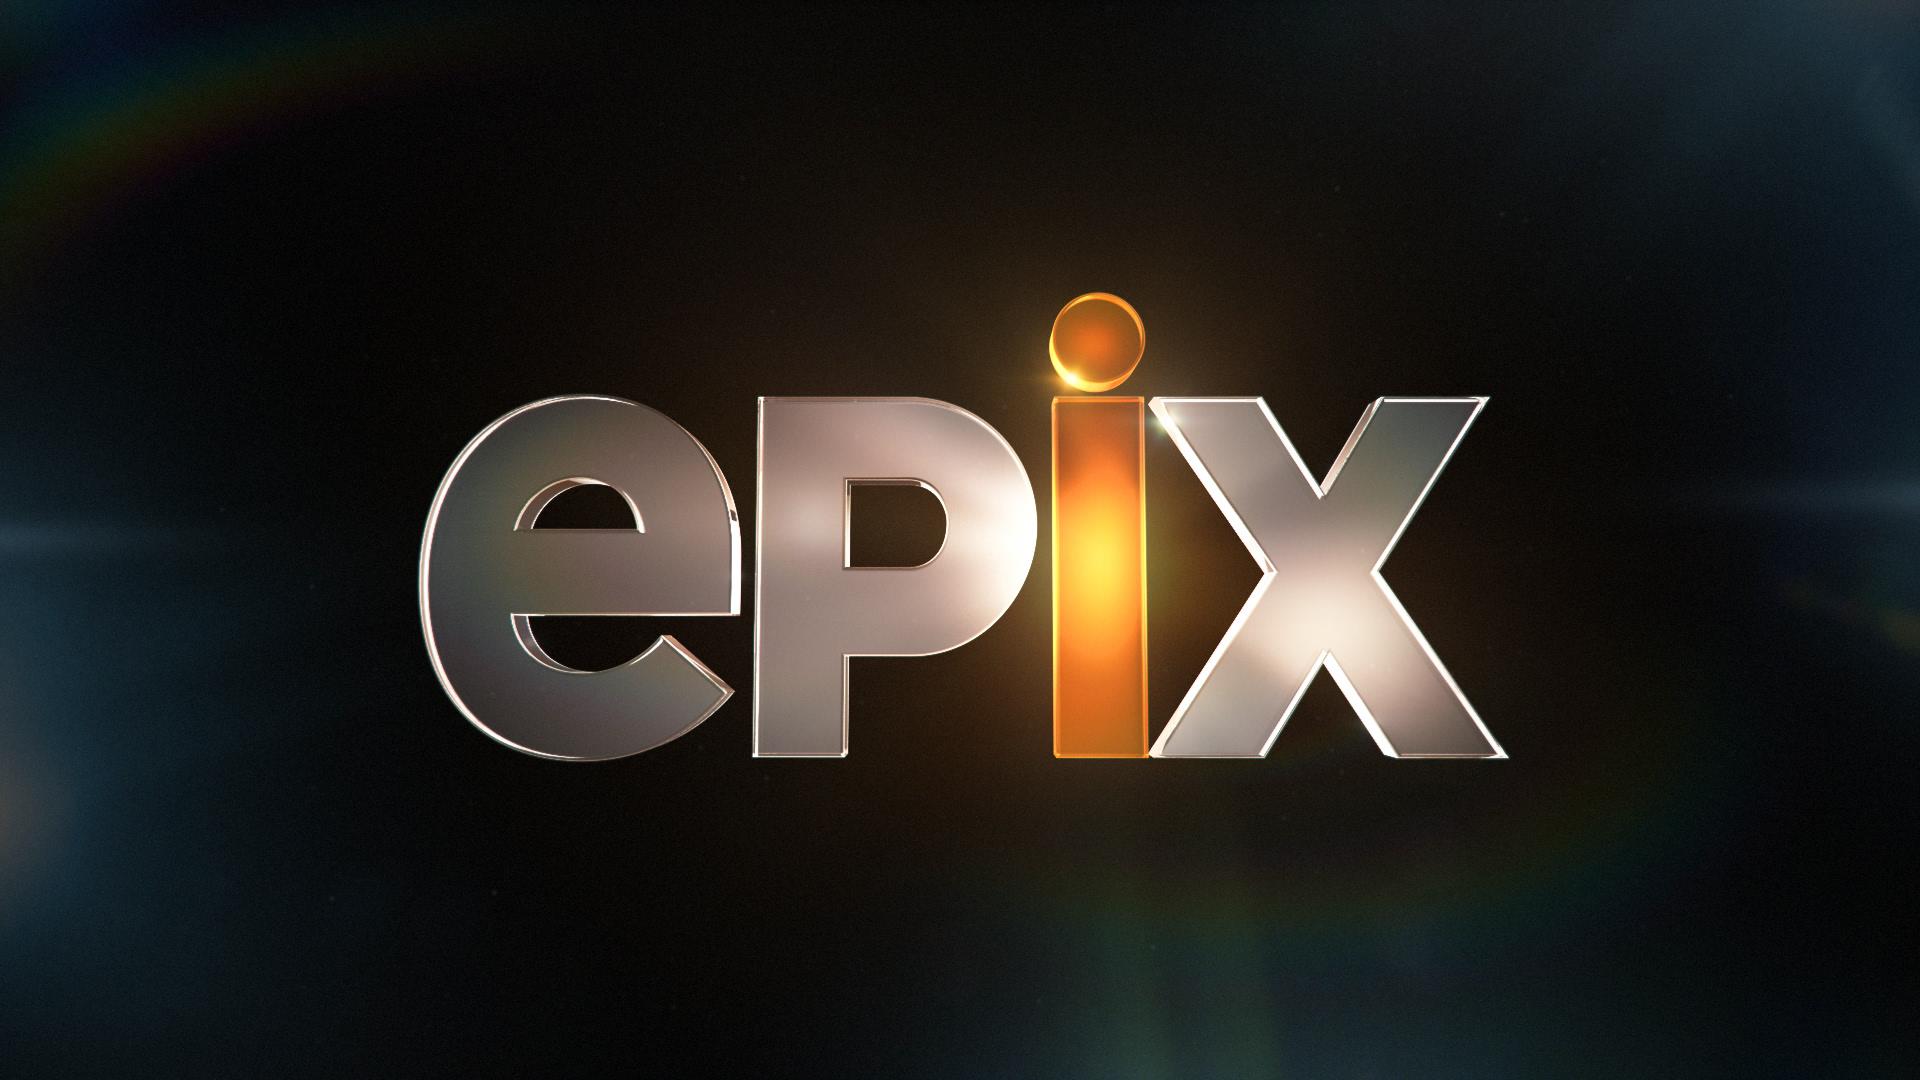 Epix_08_ID_10-Generic_1 (0-00-08-25).png